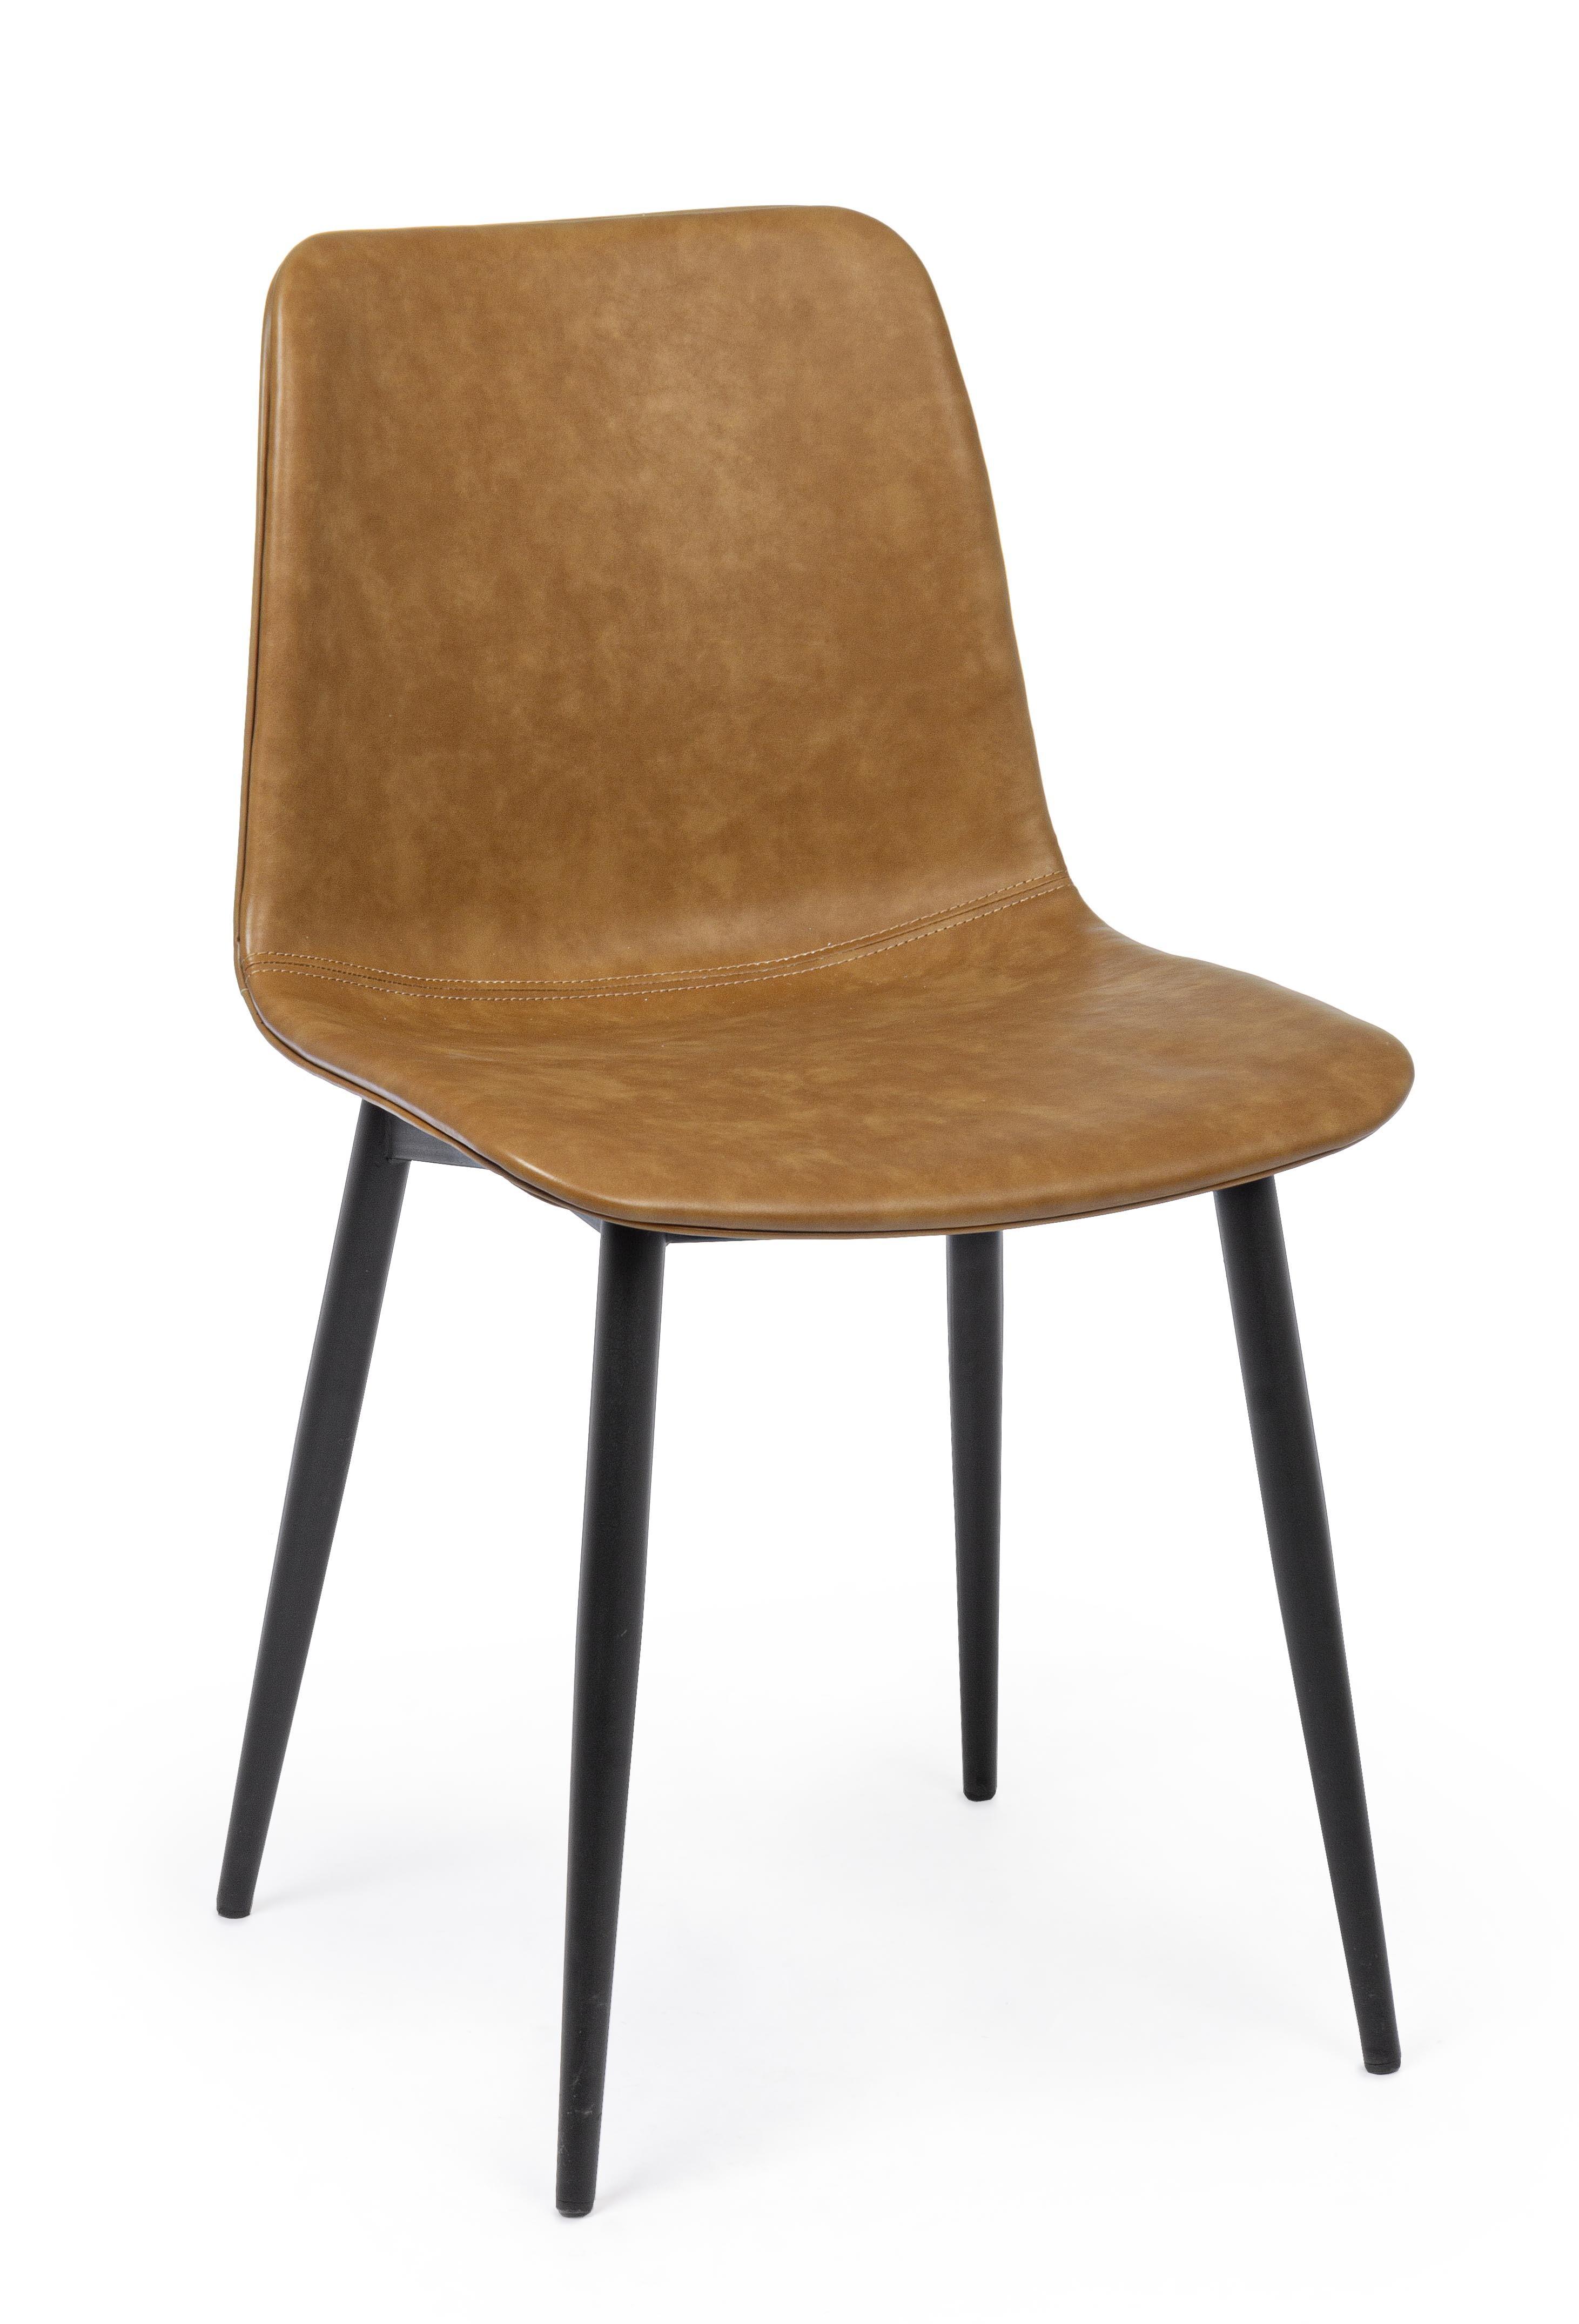 6 Stühle Kyra Pu  01